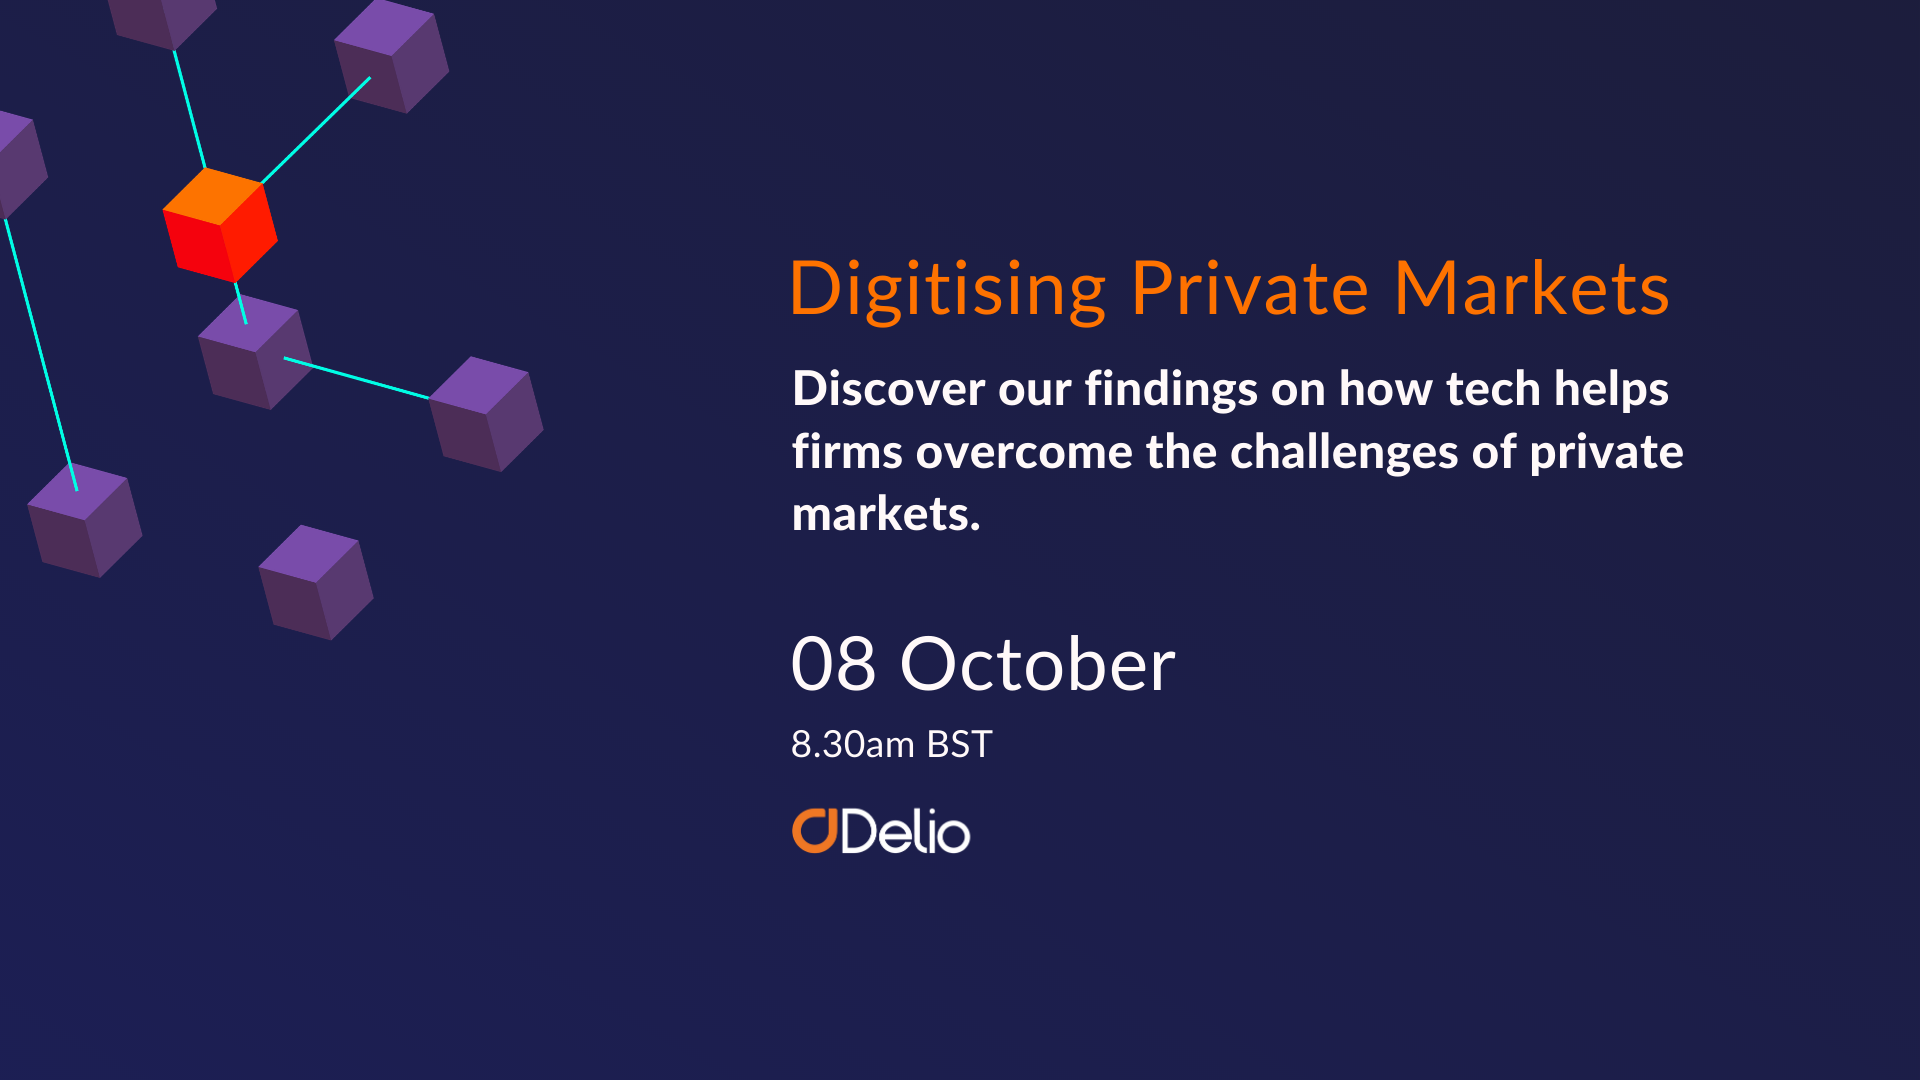 Delio Presents: Digitising Private Markets